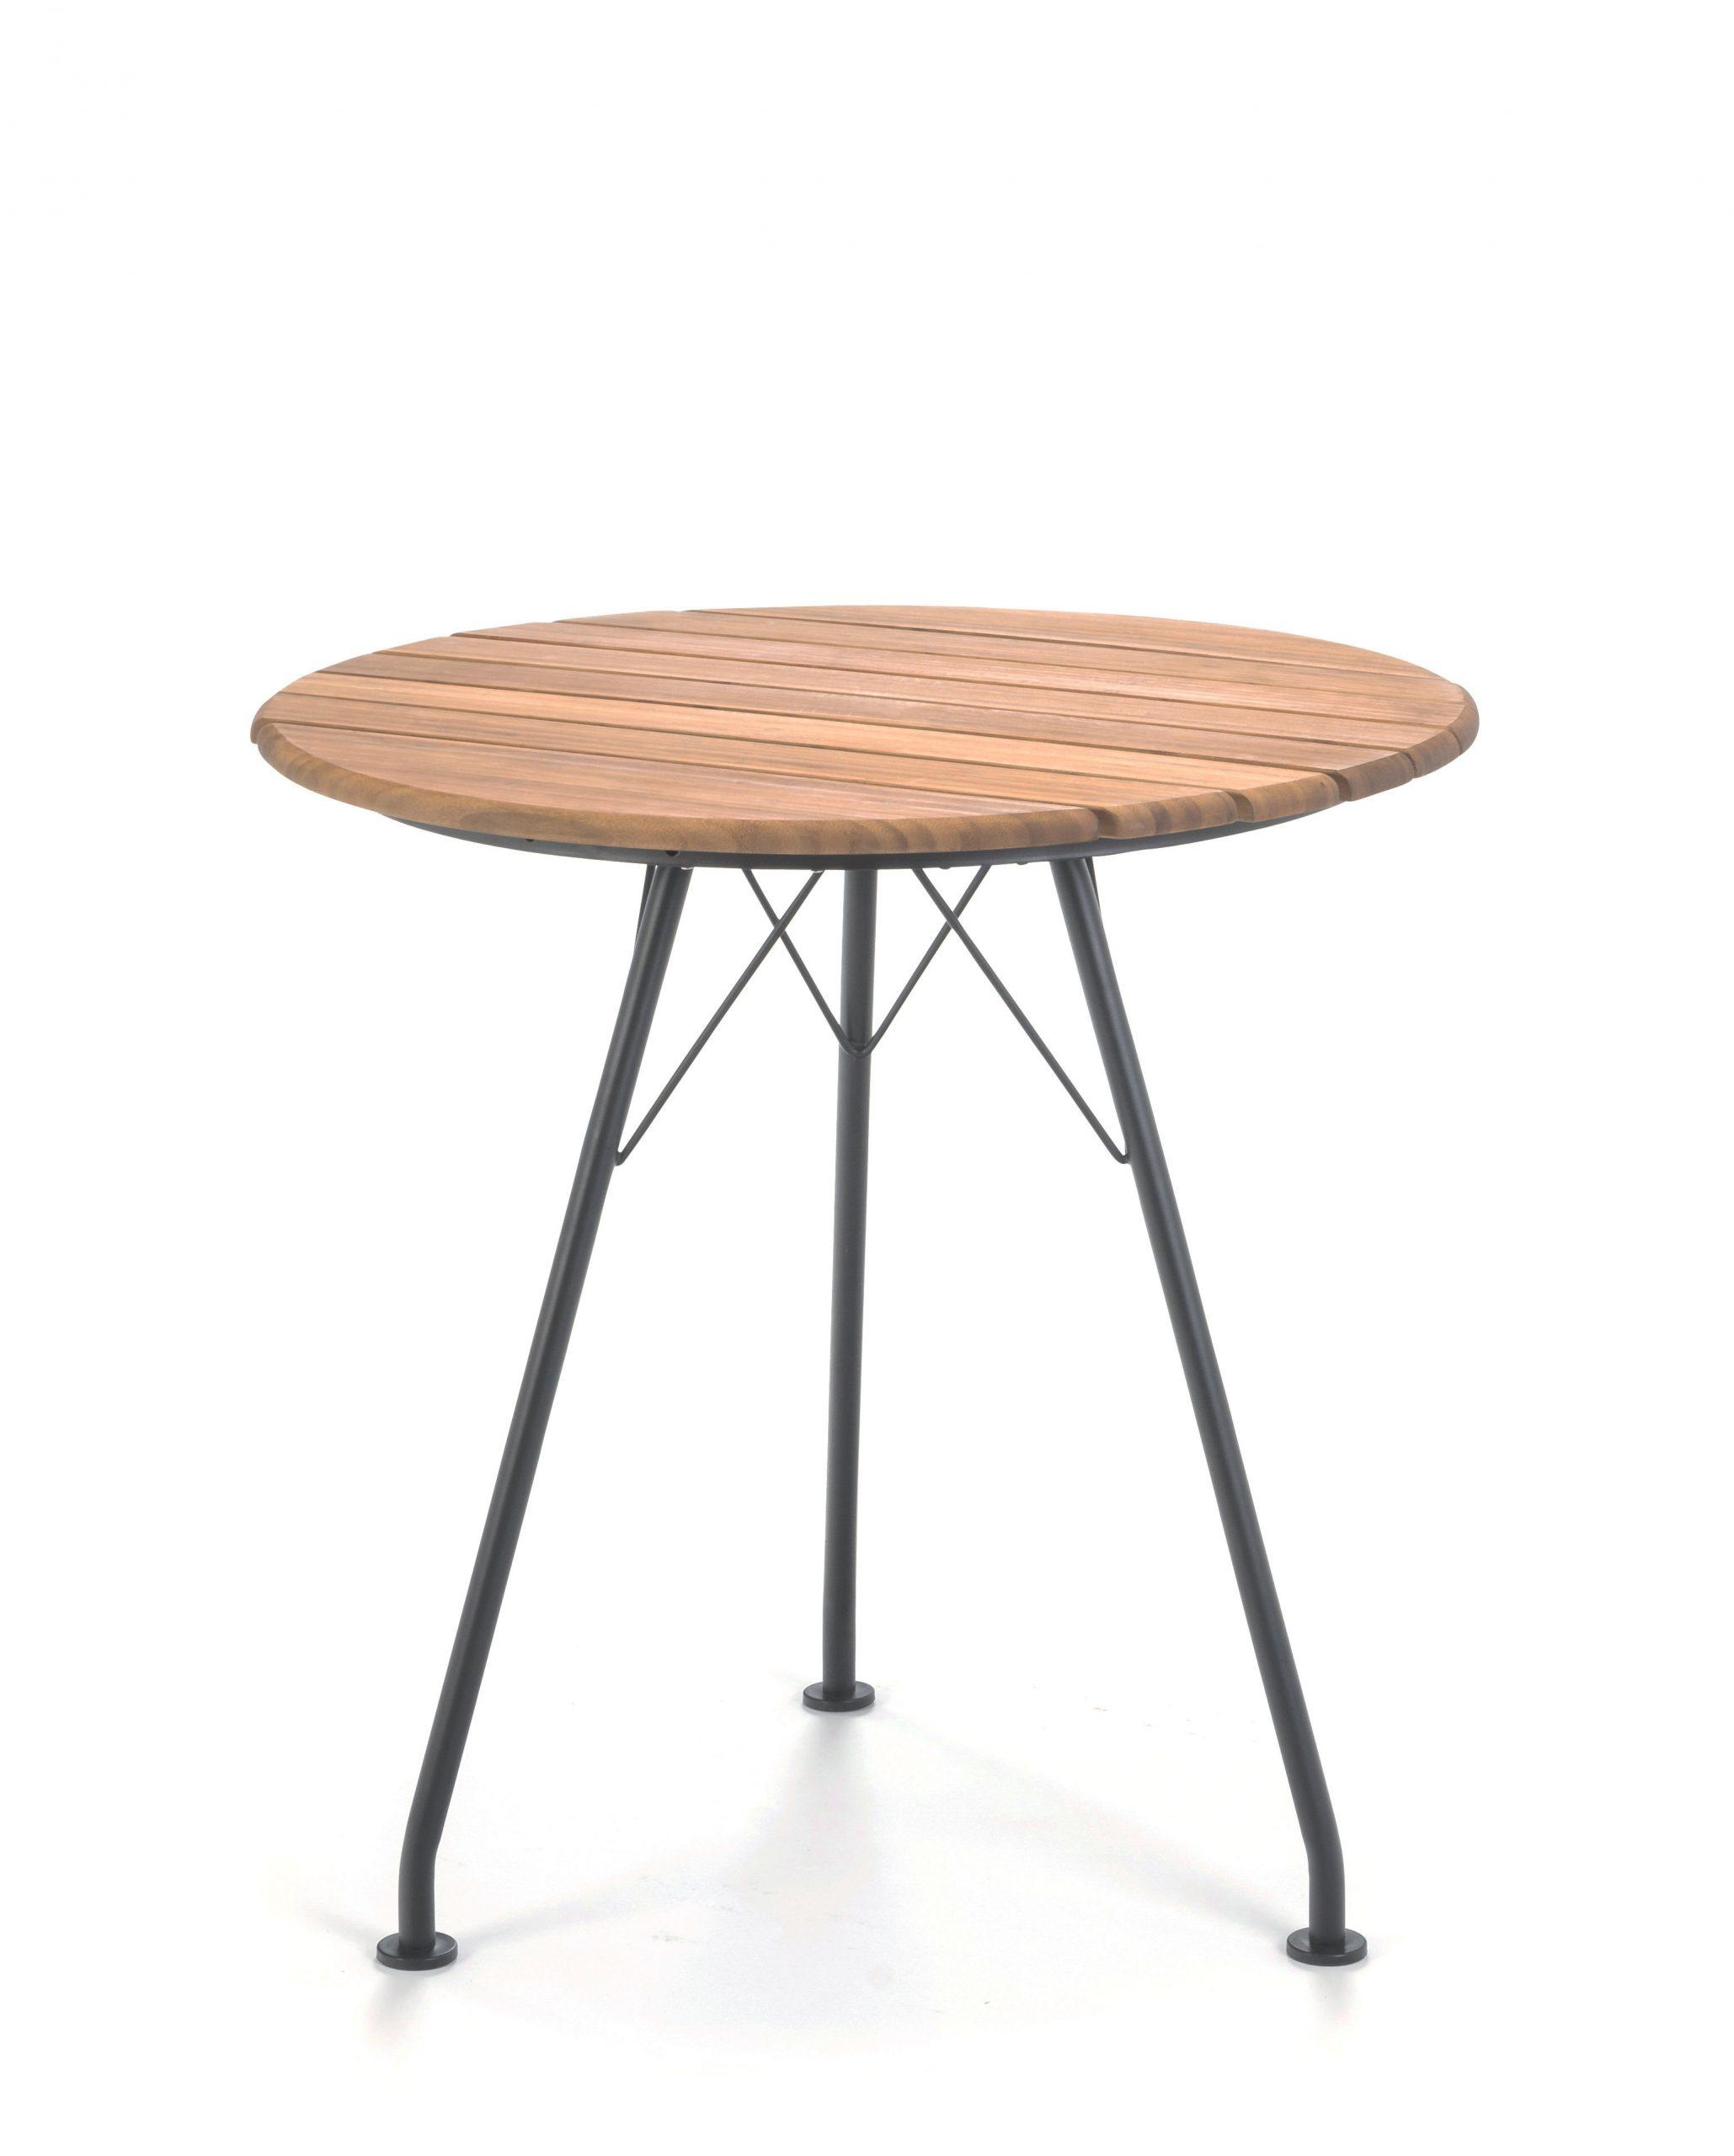 Table De Jardin Circum - Houe concernant Houe De Jardin